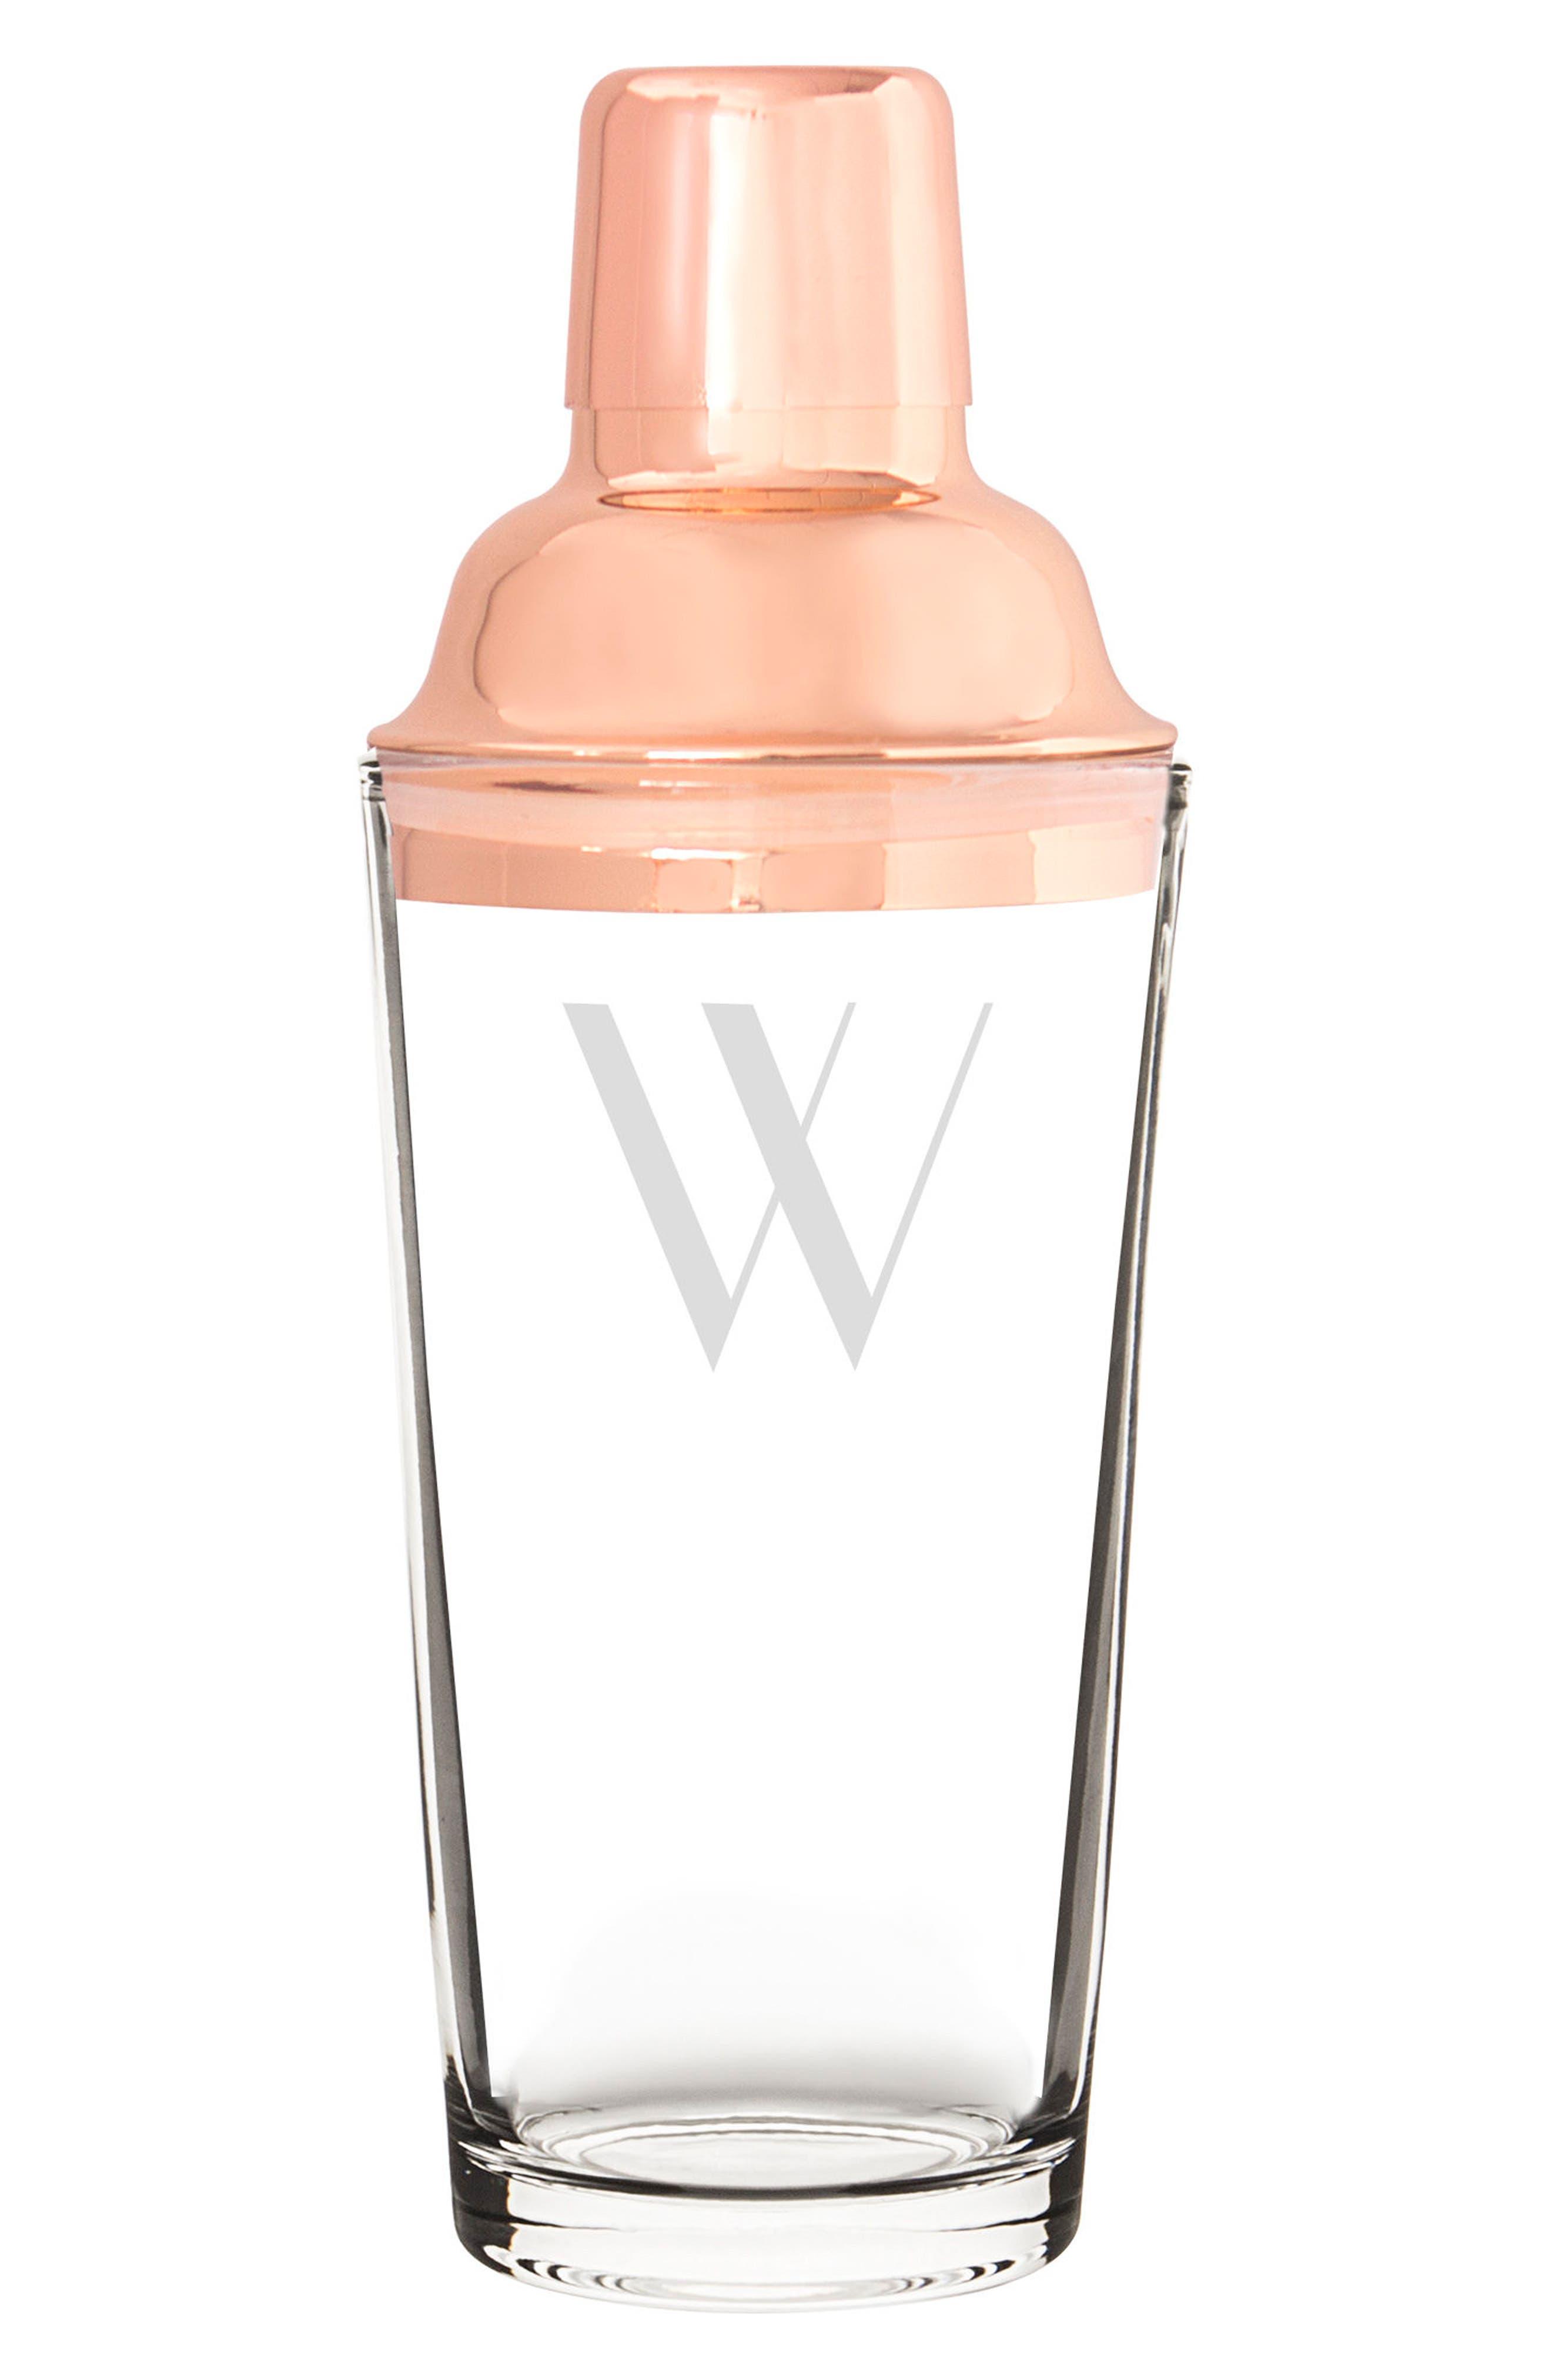 Monogram Coppertone Cocktail Shaker,                             Main thumbnail 24, color,